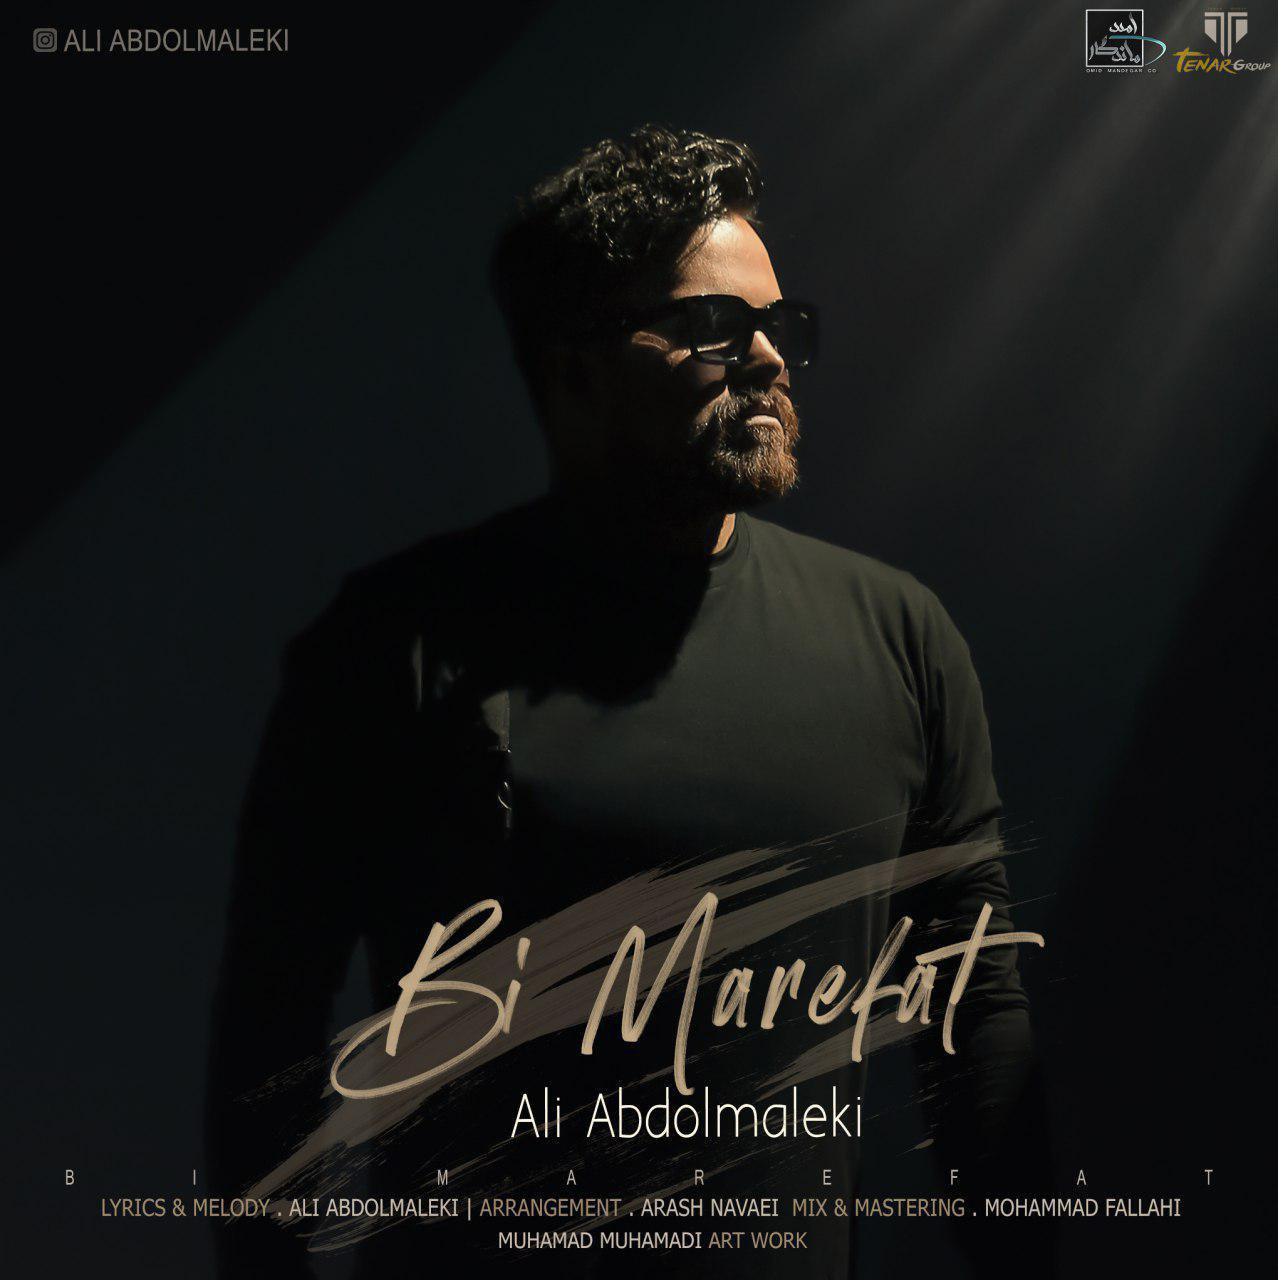 Ali Abdolmaleki – Bi Marefat